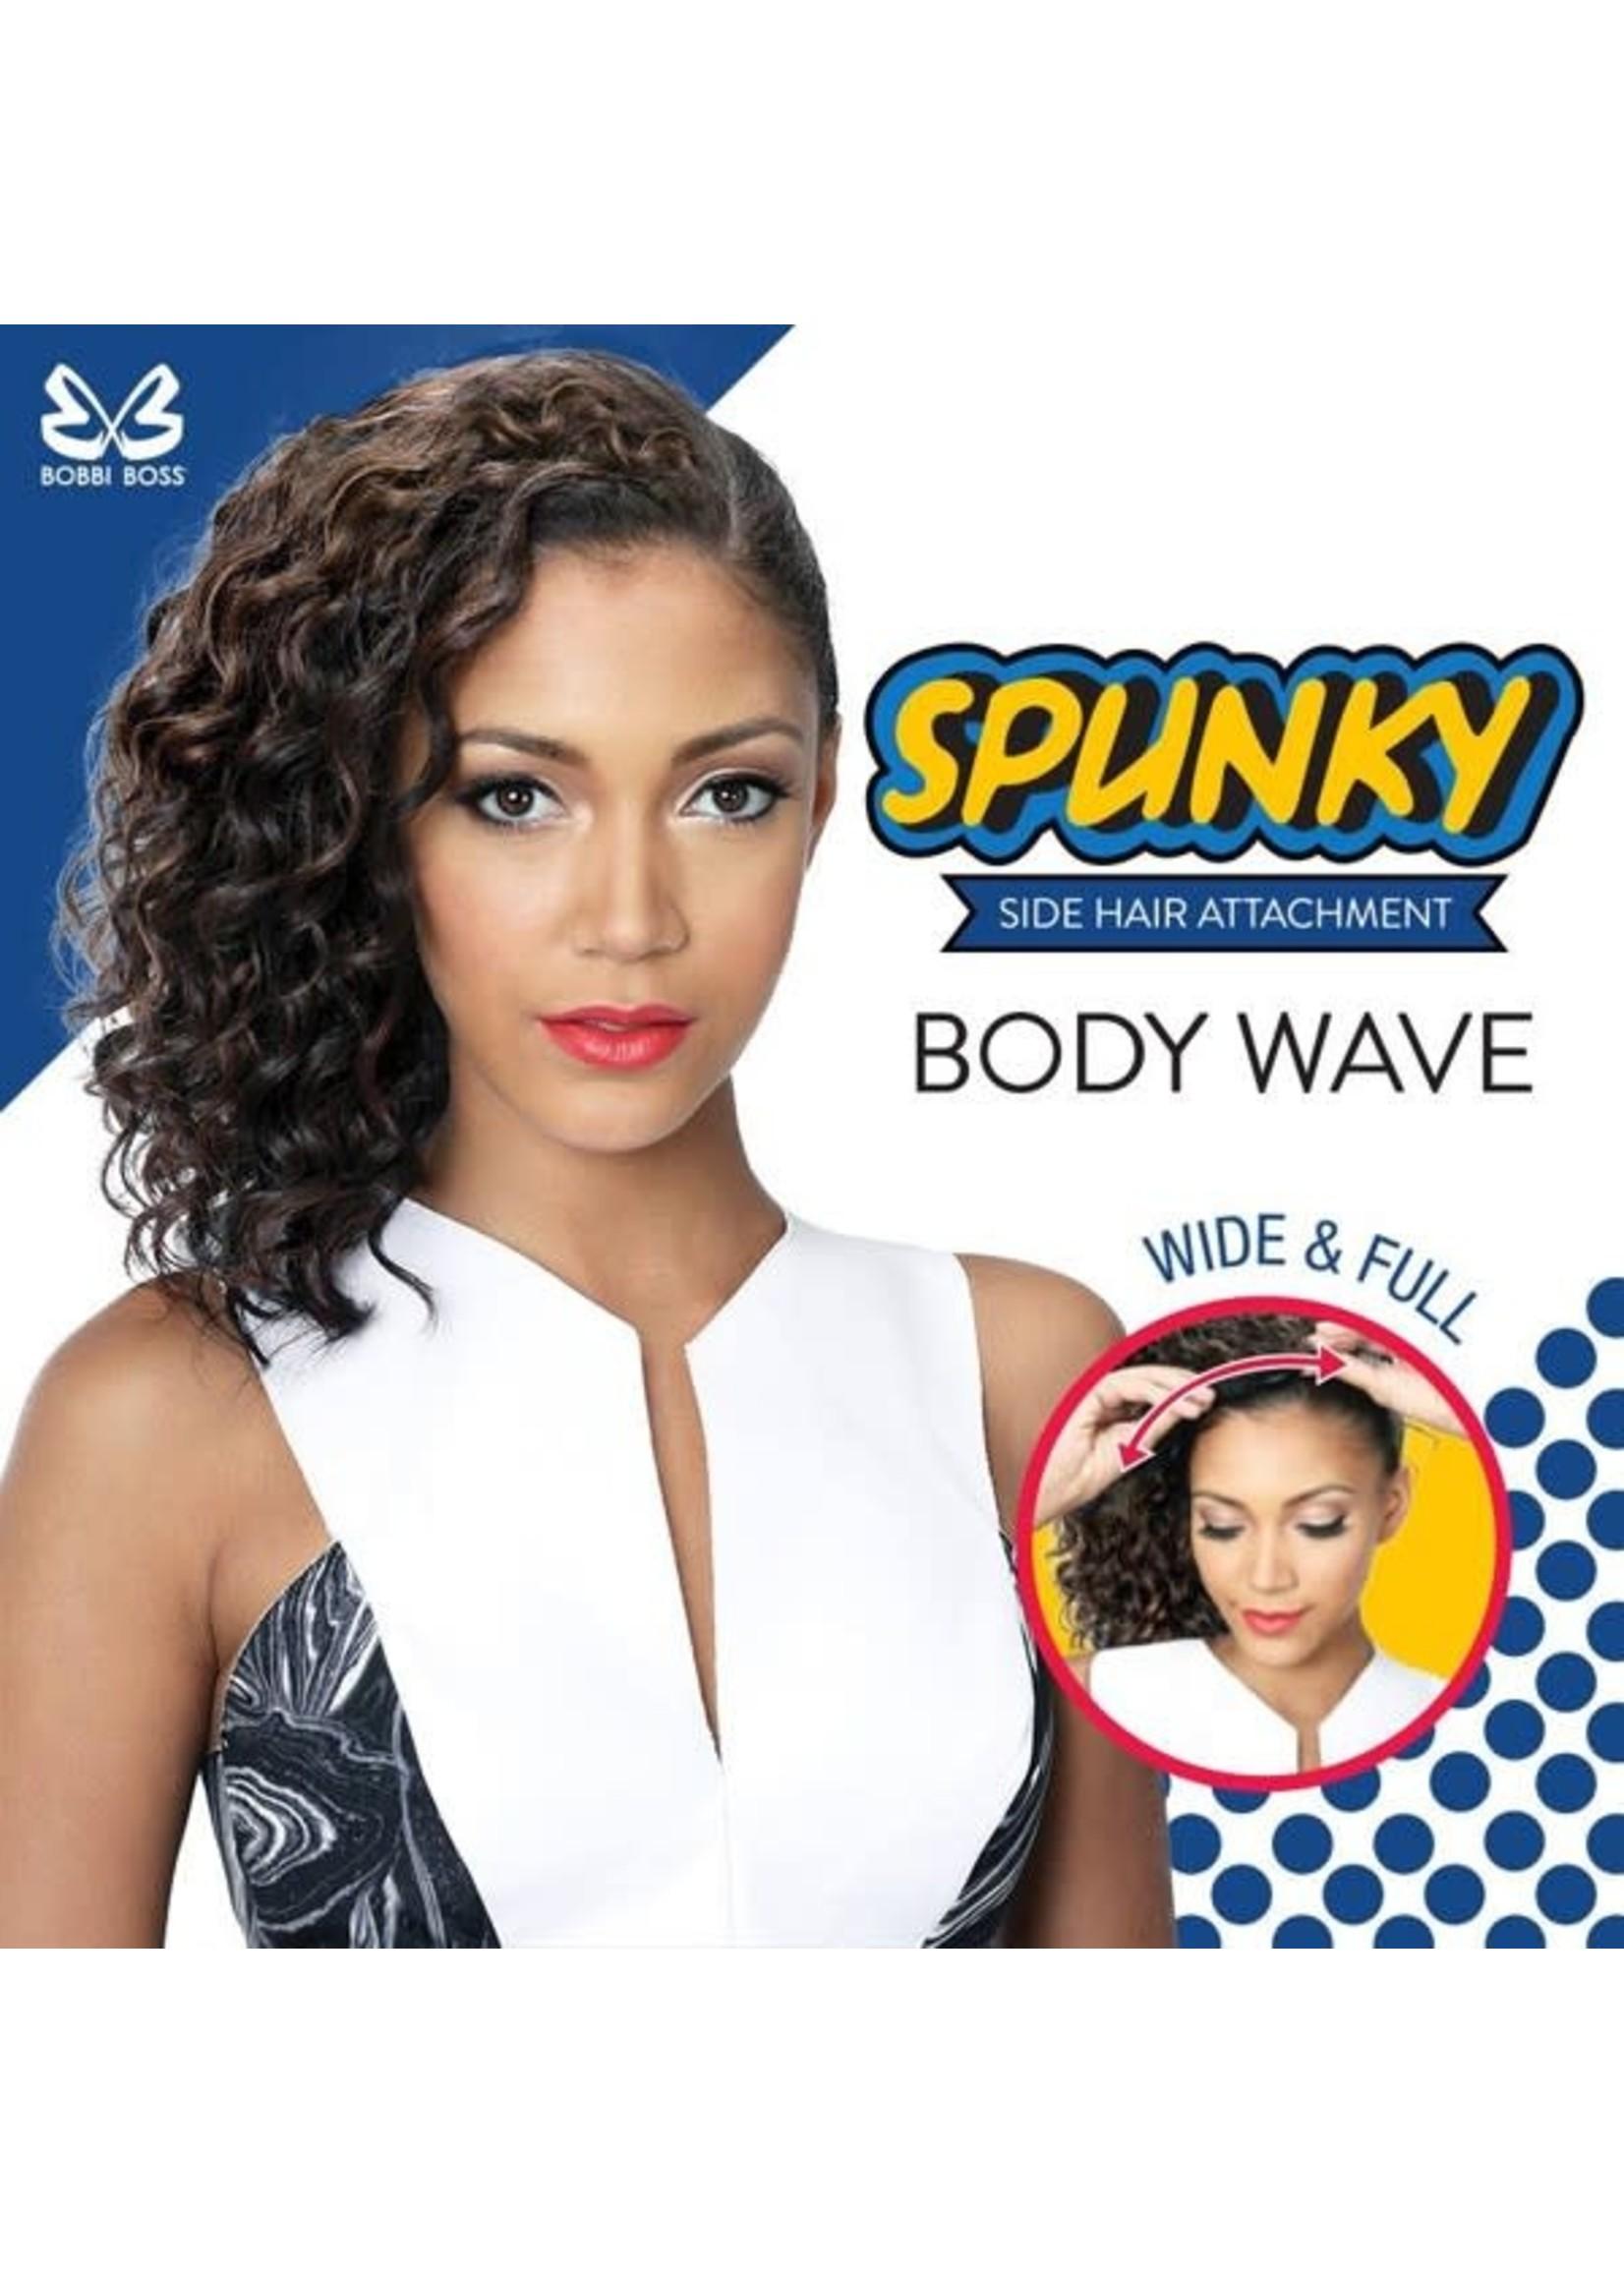 Spunky Side Hair Body Wave